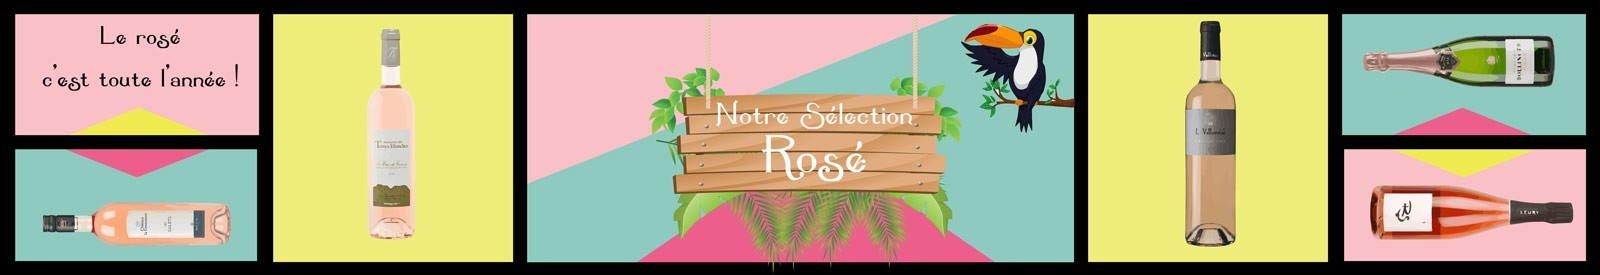 Vins Rosé Biologiques | Vignapart